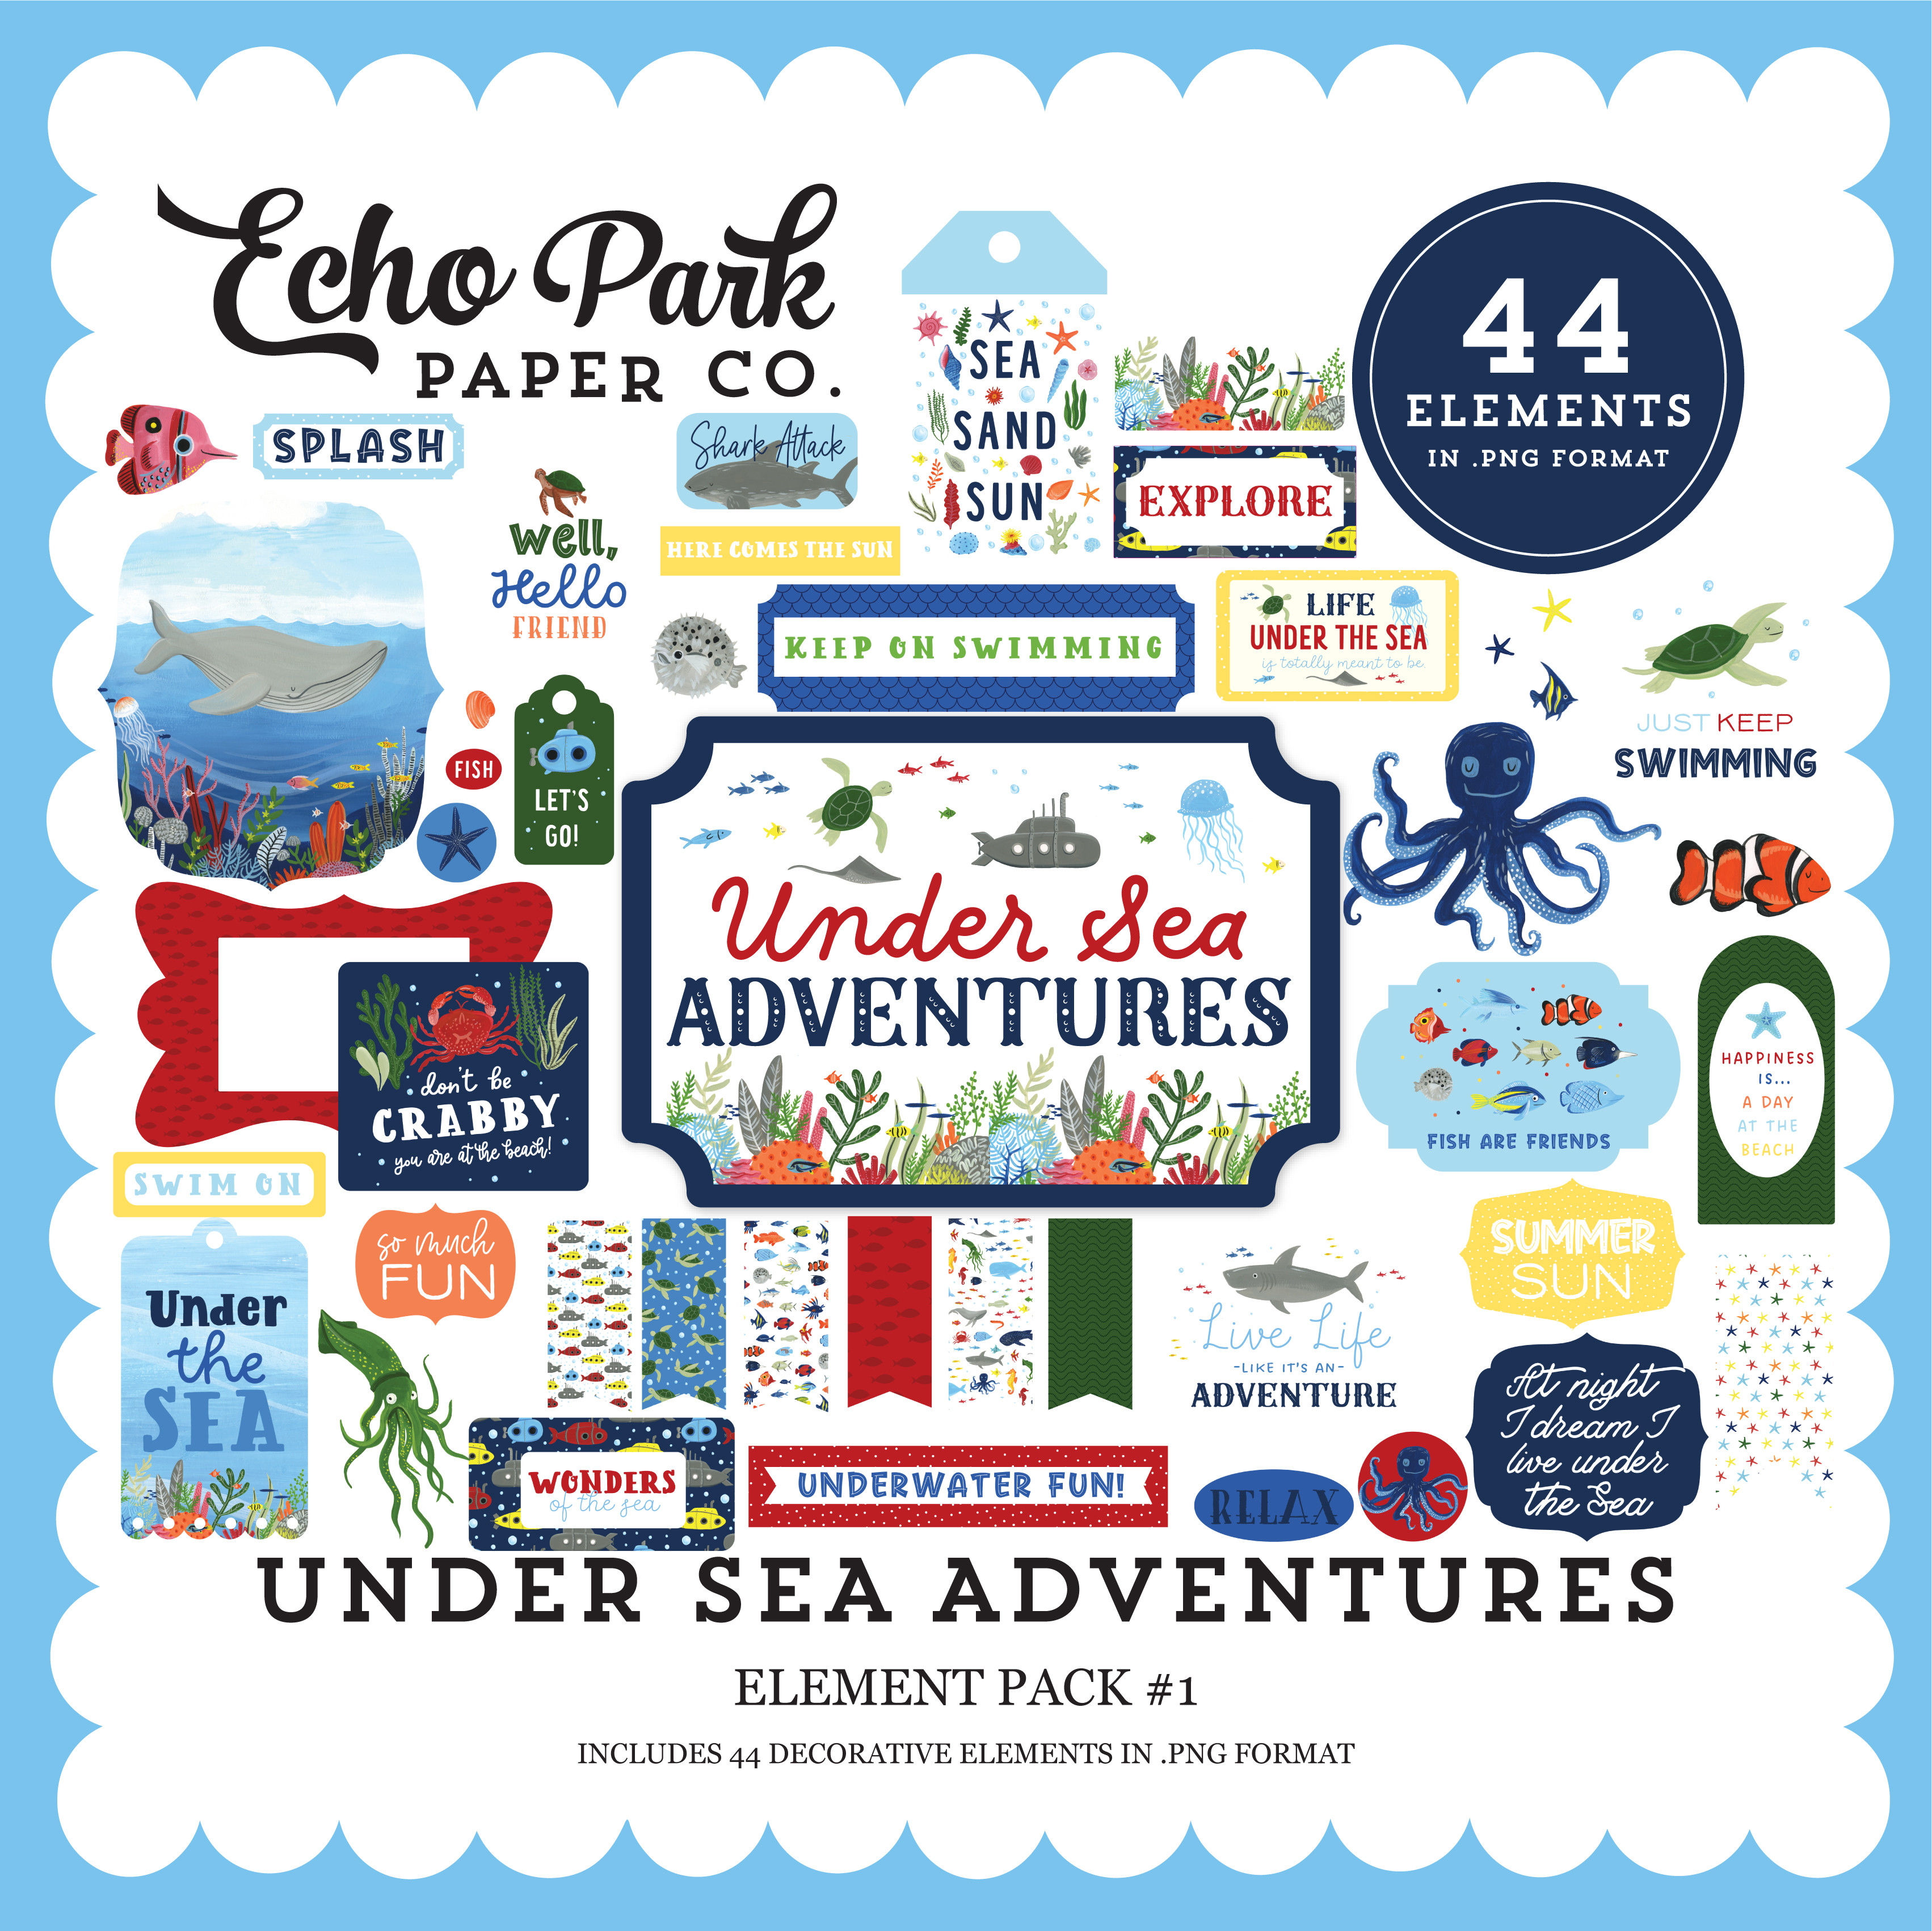 Under Sea Adventures Element Pack #1